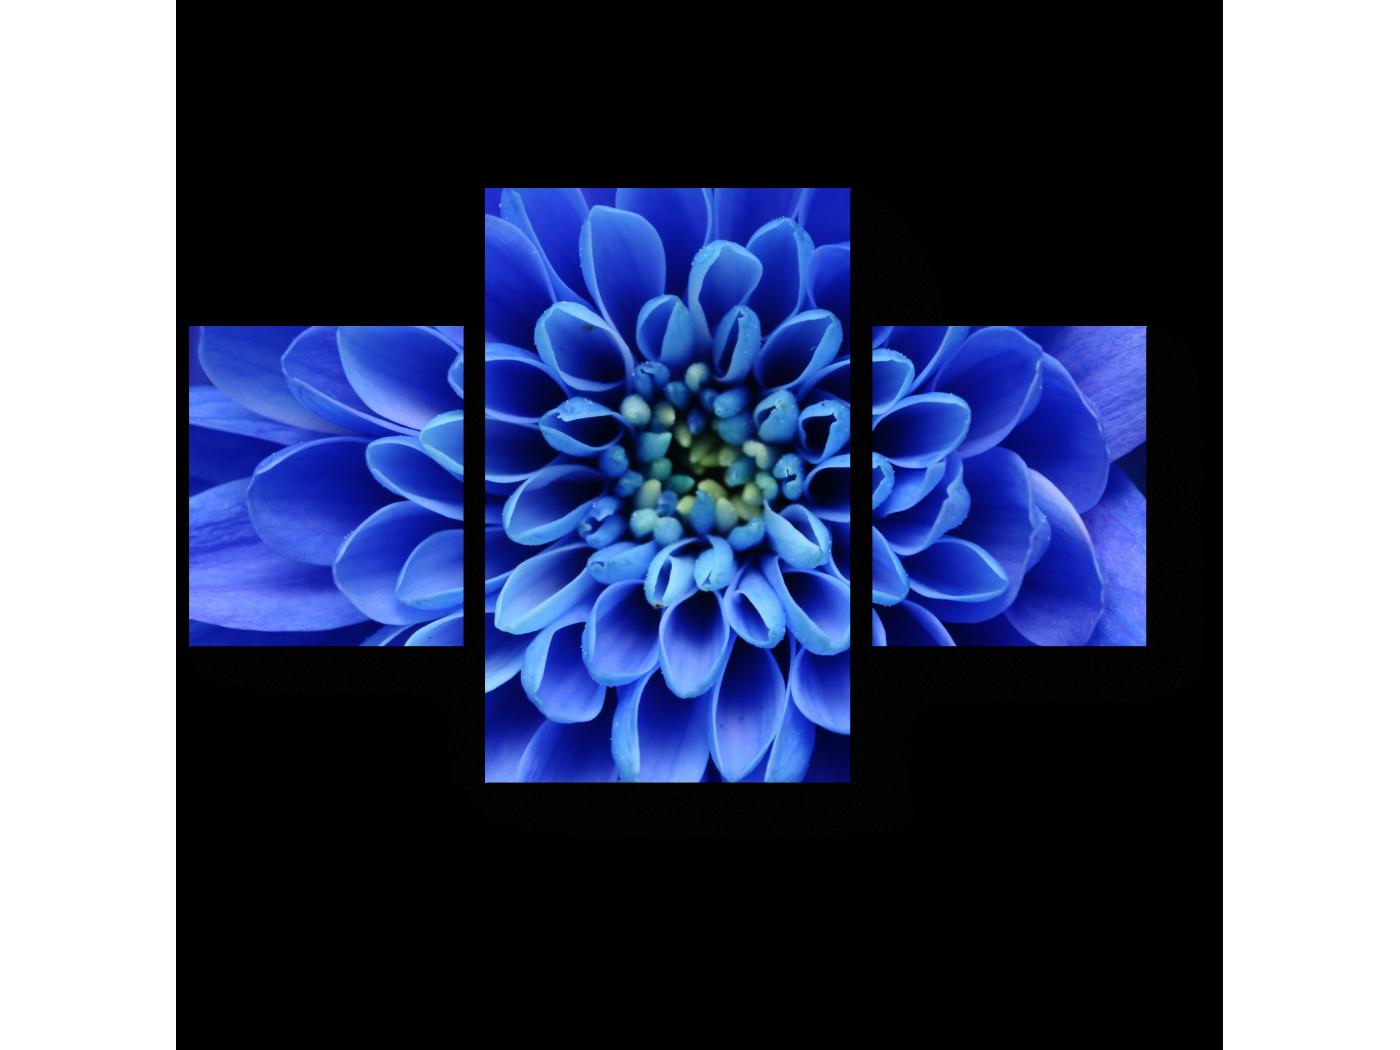 Модульная картина В сердце синего (80x52) фото